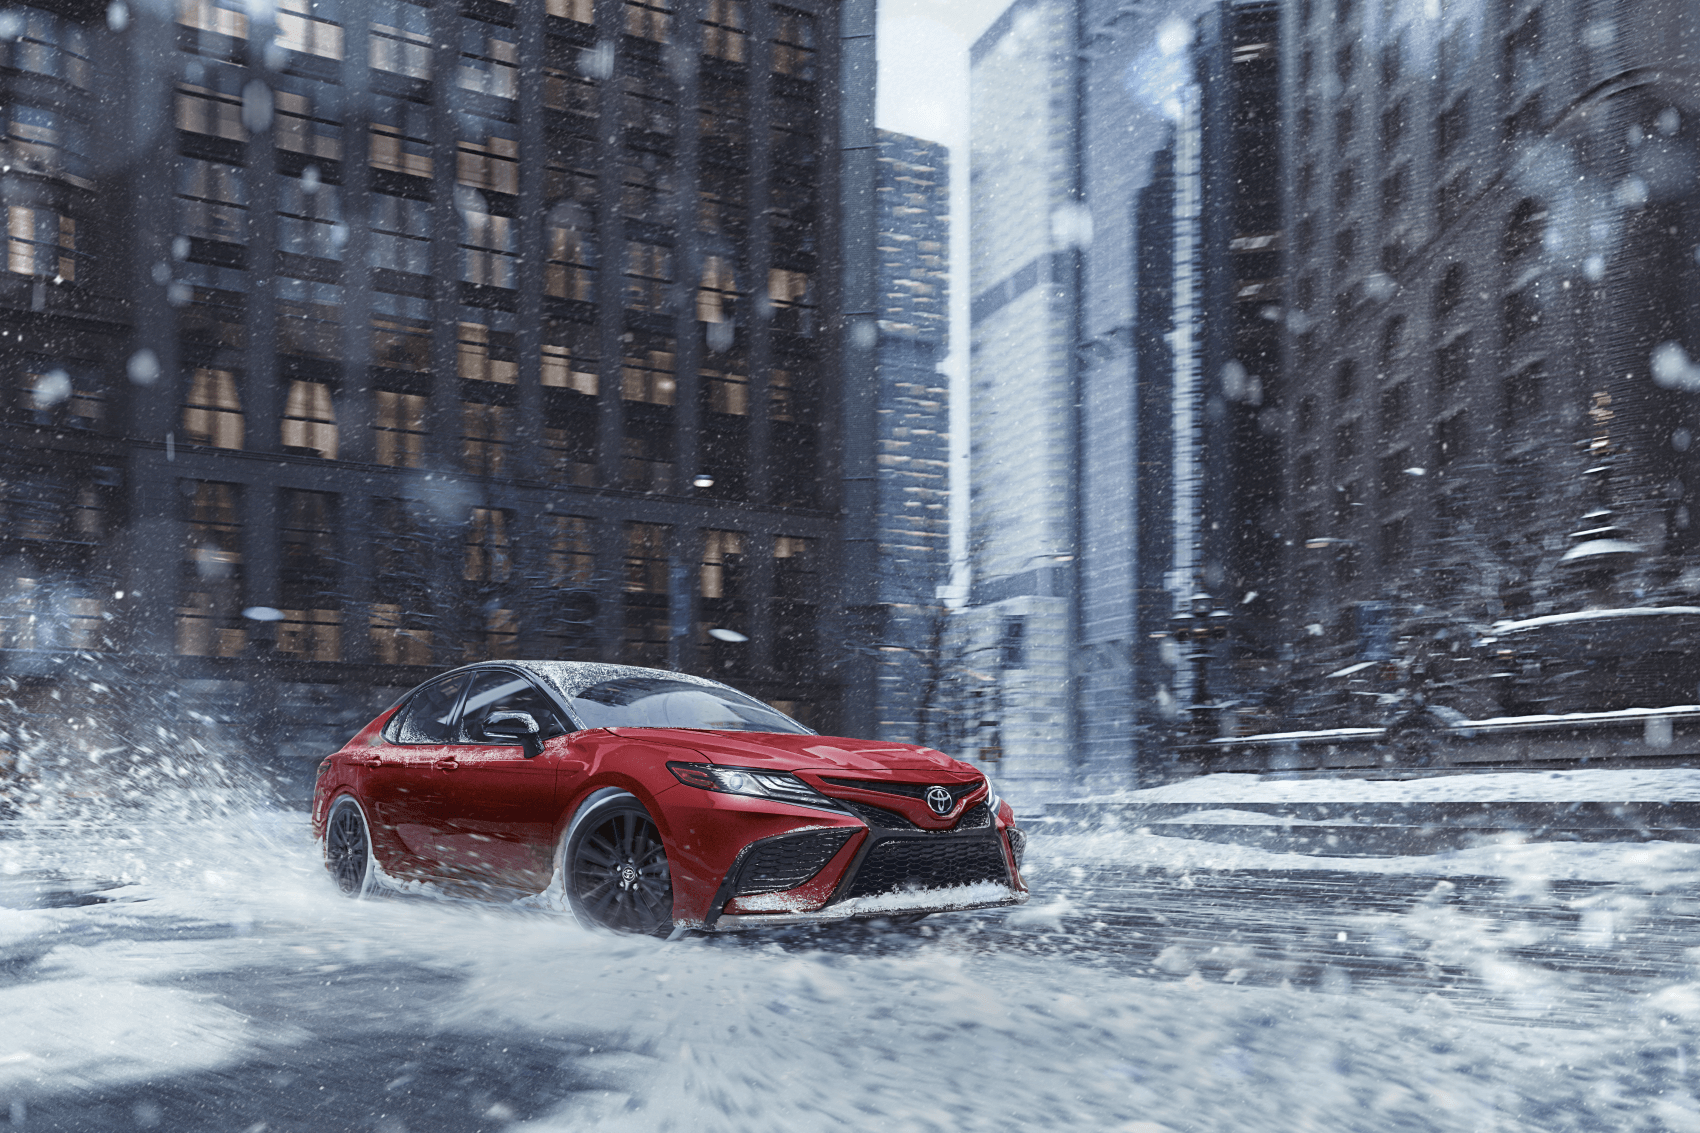 2021 Toyota Camry Red City Snow Winter Harr Toyota